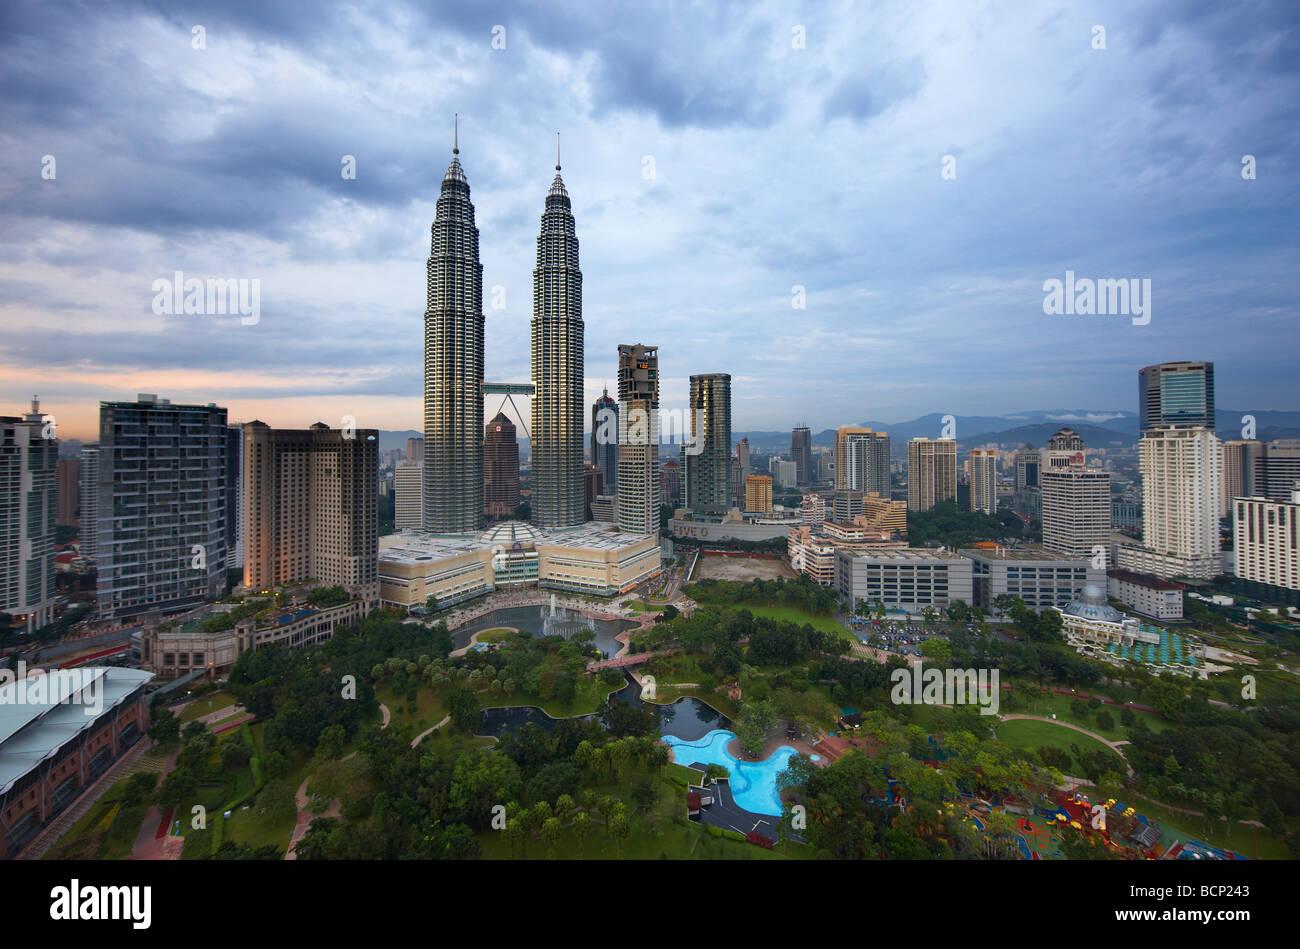 the Petronas Towers and the Kuala Lumpur skyline at dusk, Malaysia - Stock Image